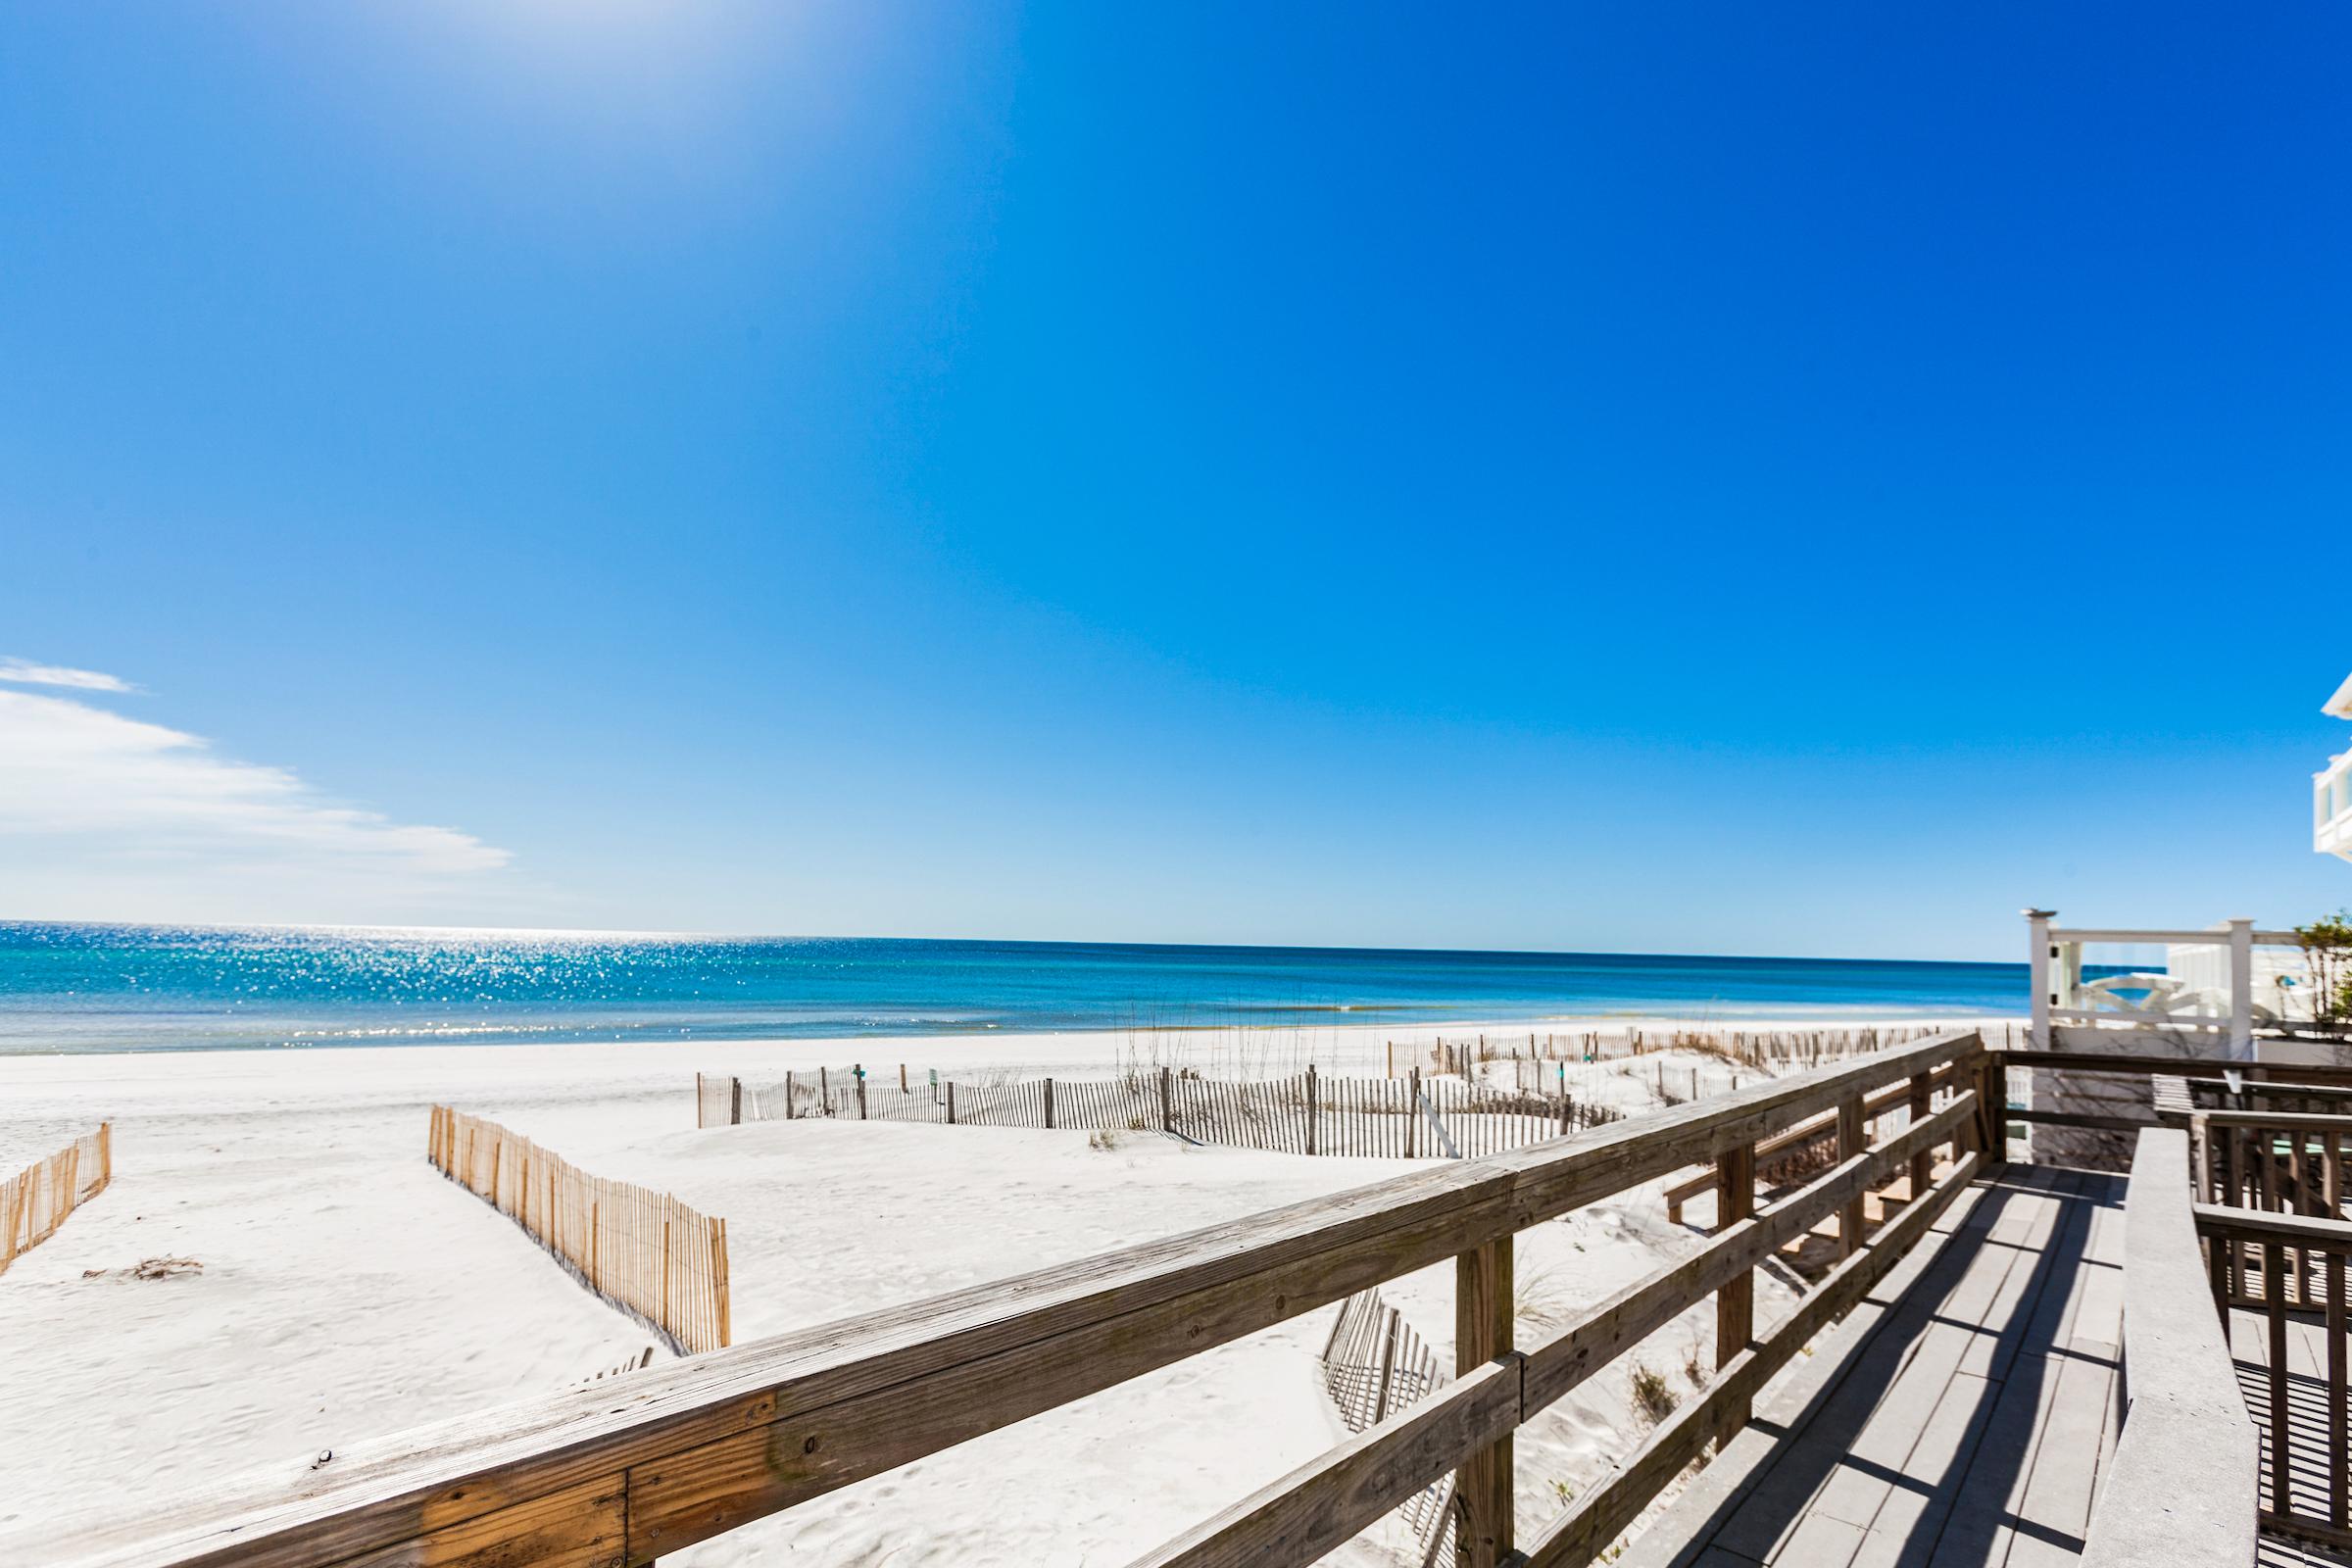 Santa Rosa Beach FL Vacation Rental Welcome to Seagrove